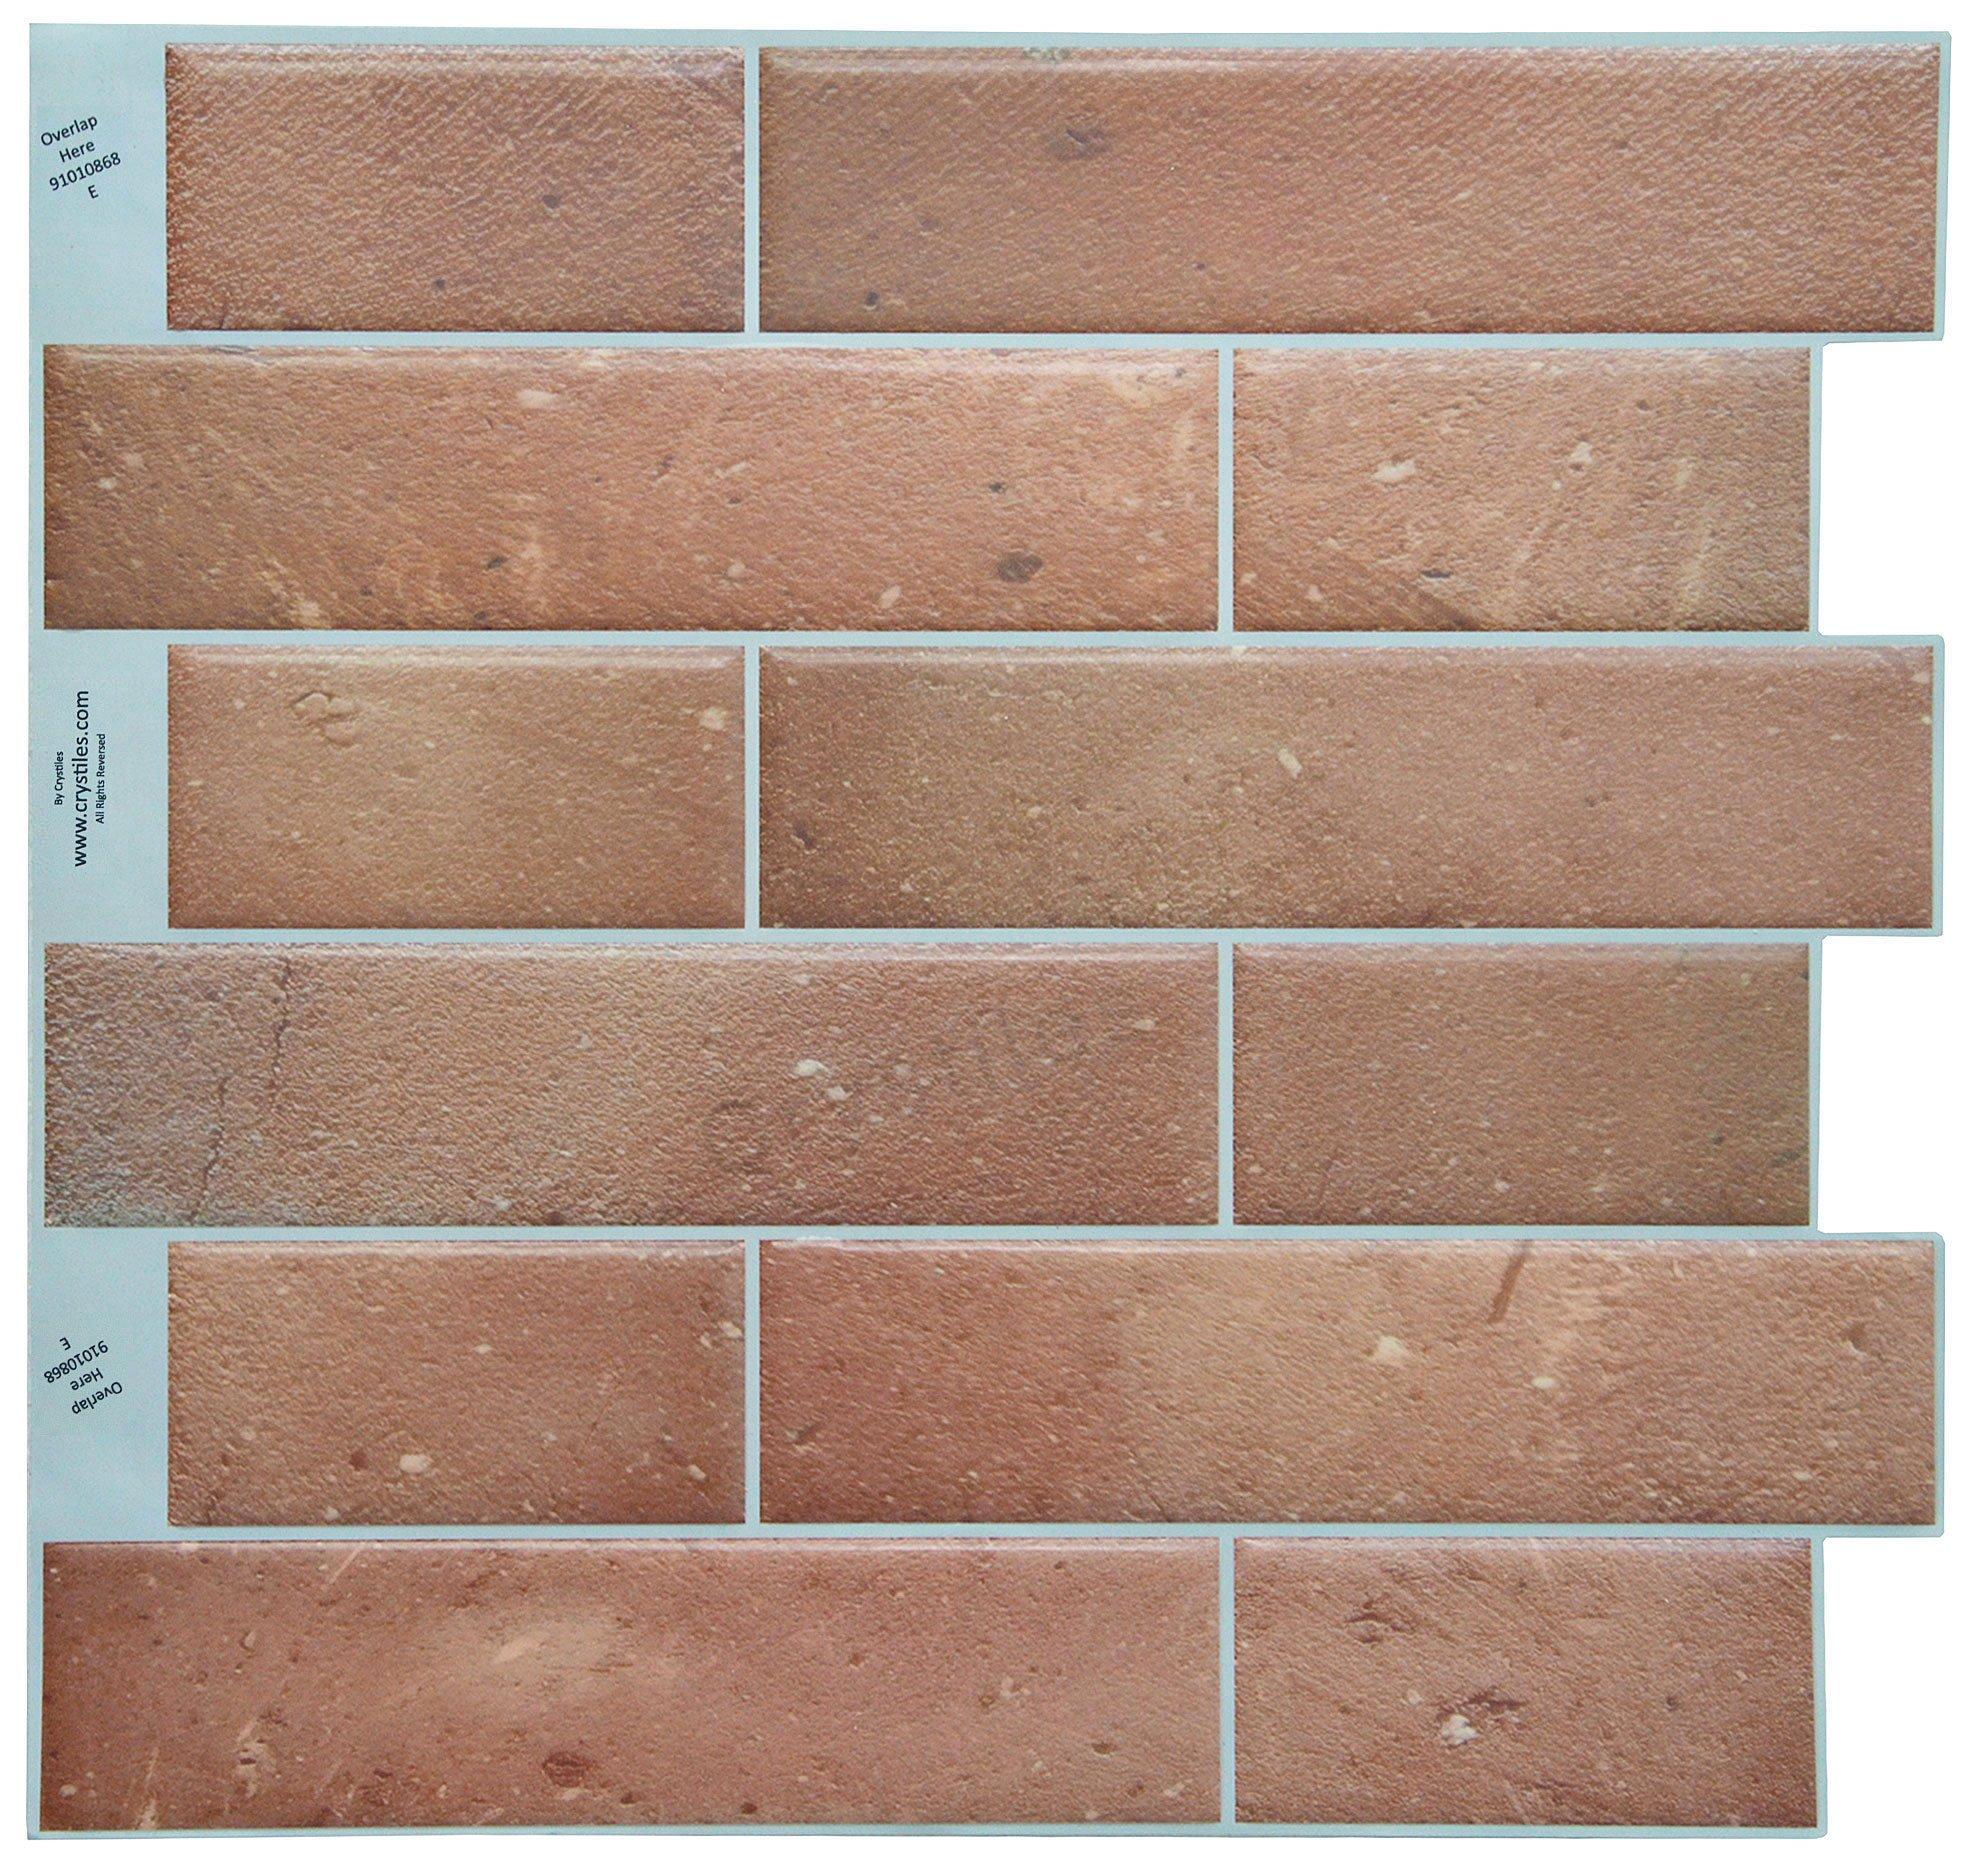 Crystiles Peel and Stick Adhesive DIY Backsplash Tile Stick-on Vinyl Wall Tile, Red Brick, Matt Finish, Item #91010868, 10'' X 10'' Each, 6 Sheets Pack by Crystiles